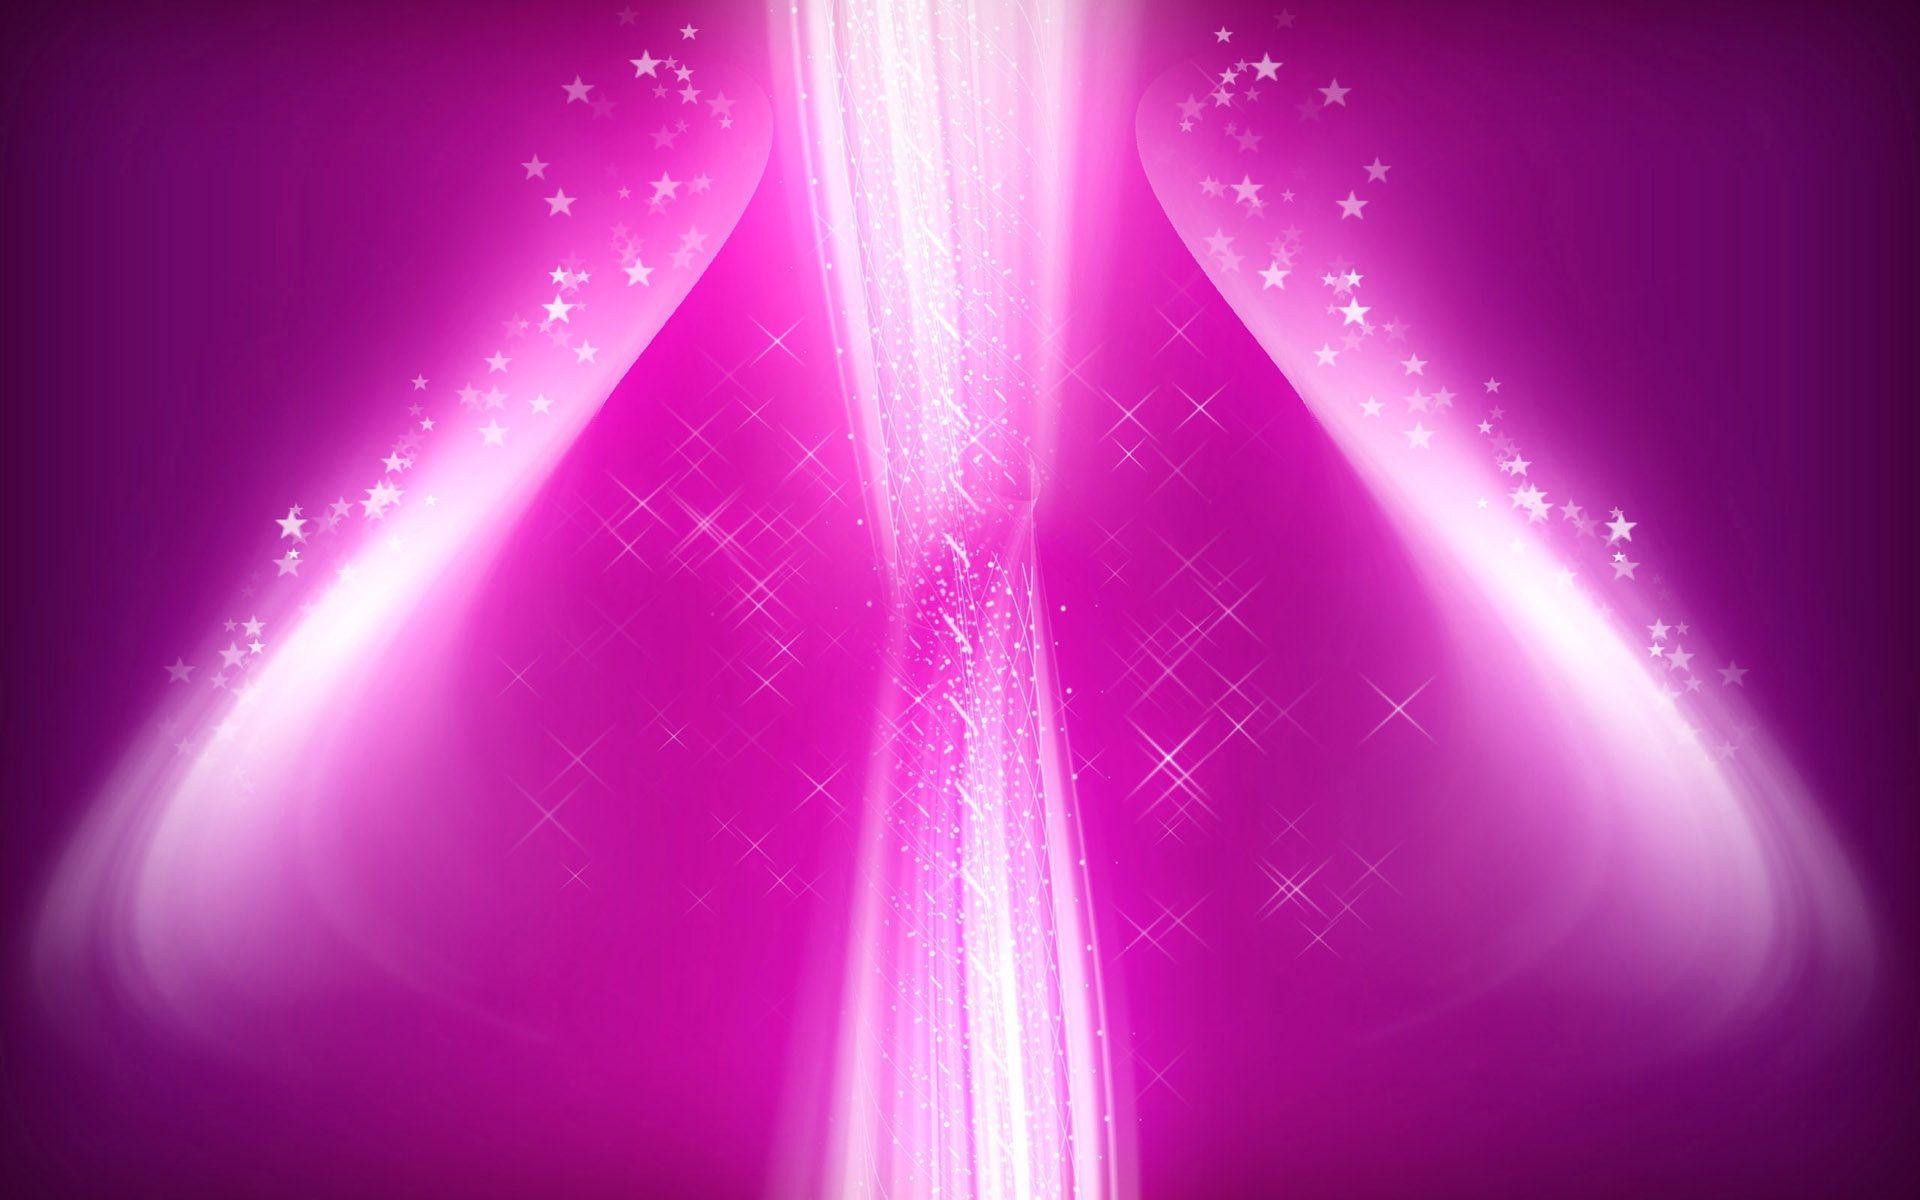 Neon Glow Pink Color - HD Wallpaper